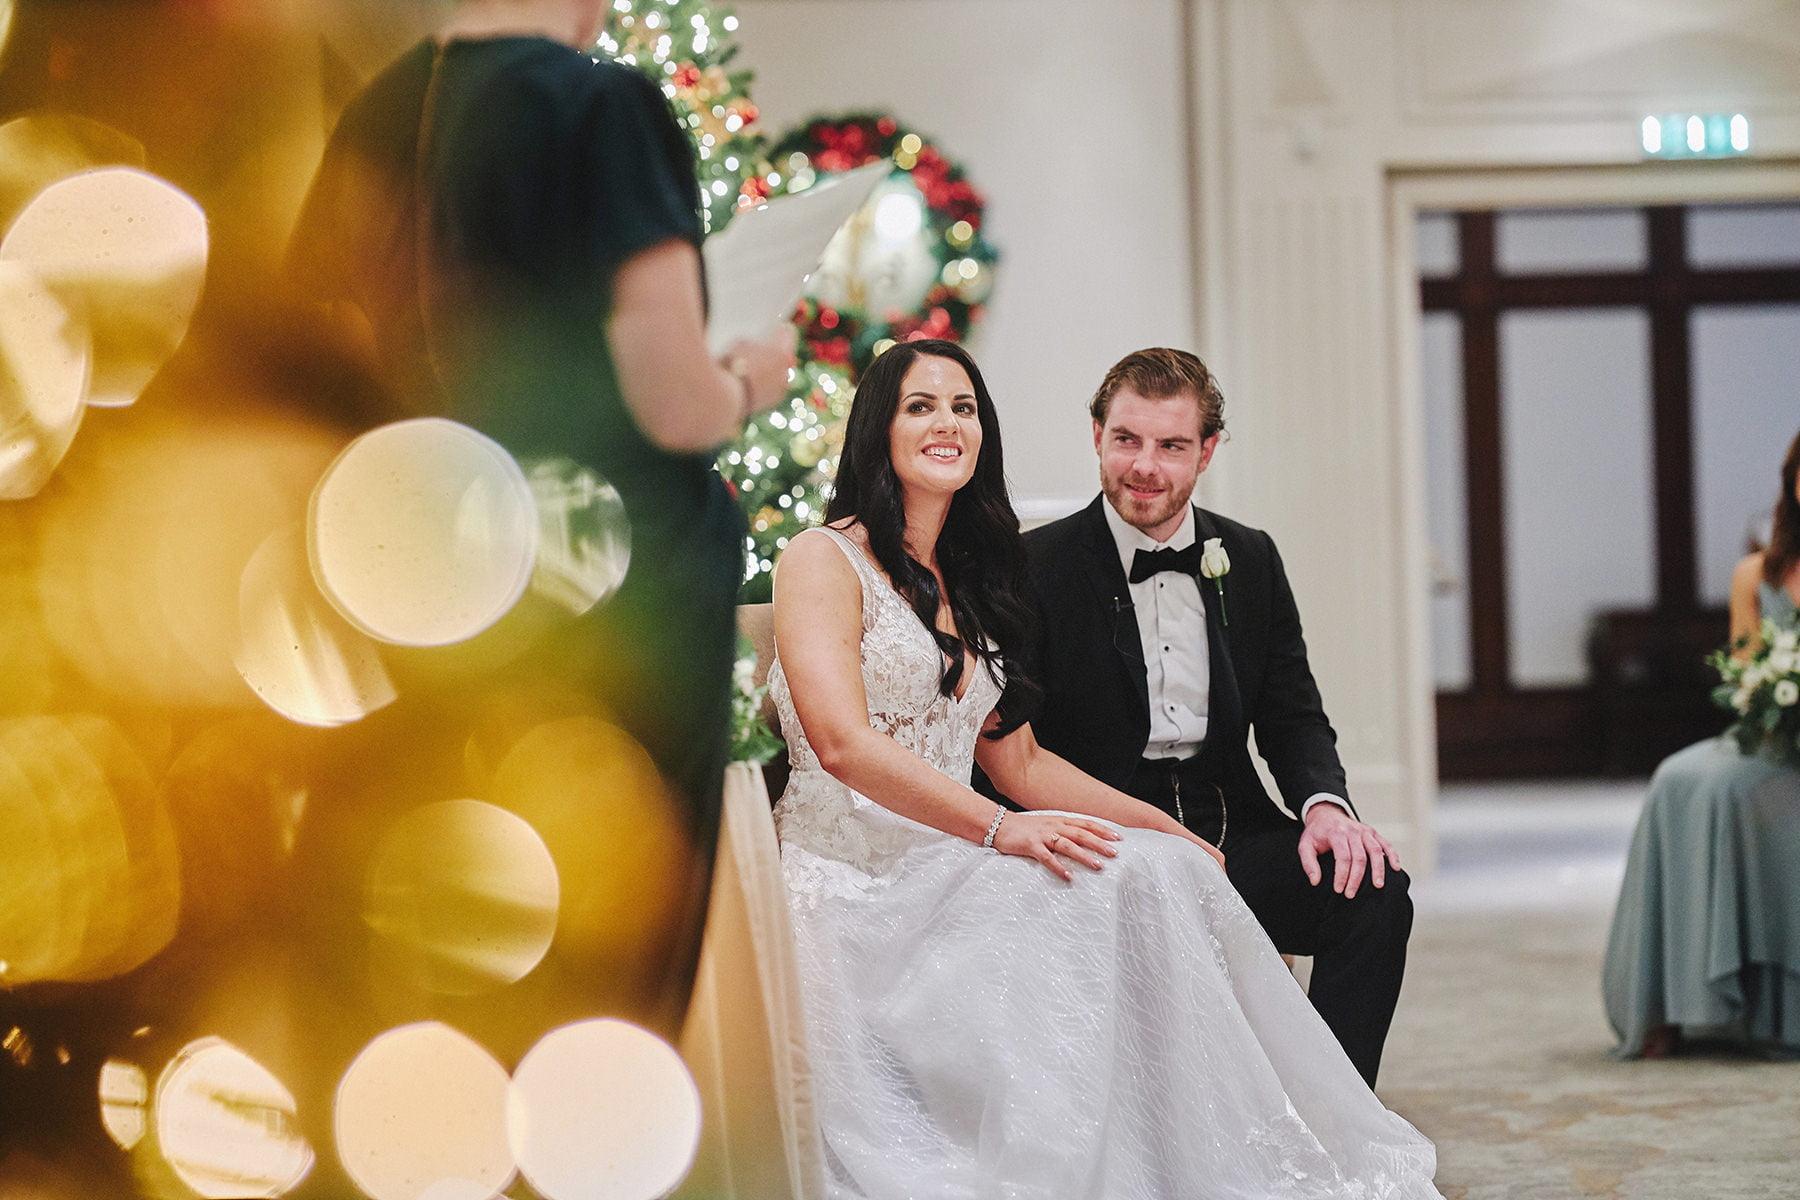 POWERSCOURT HOTEL RESORT INTIMATE WEDDING 50